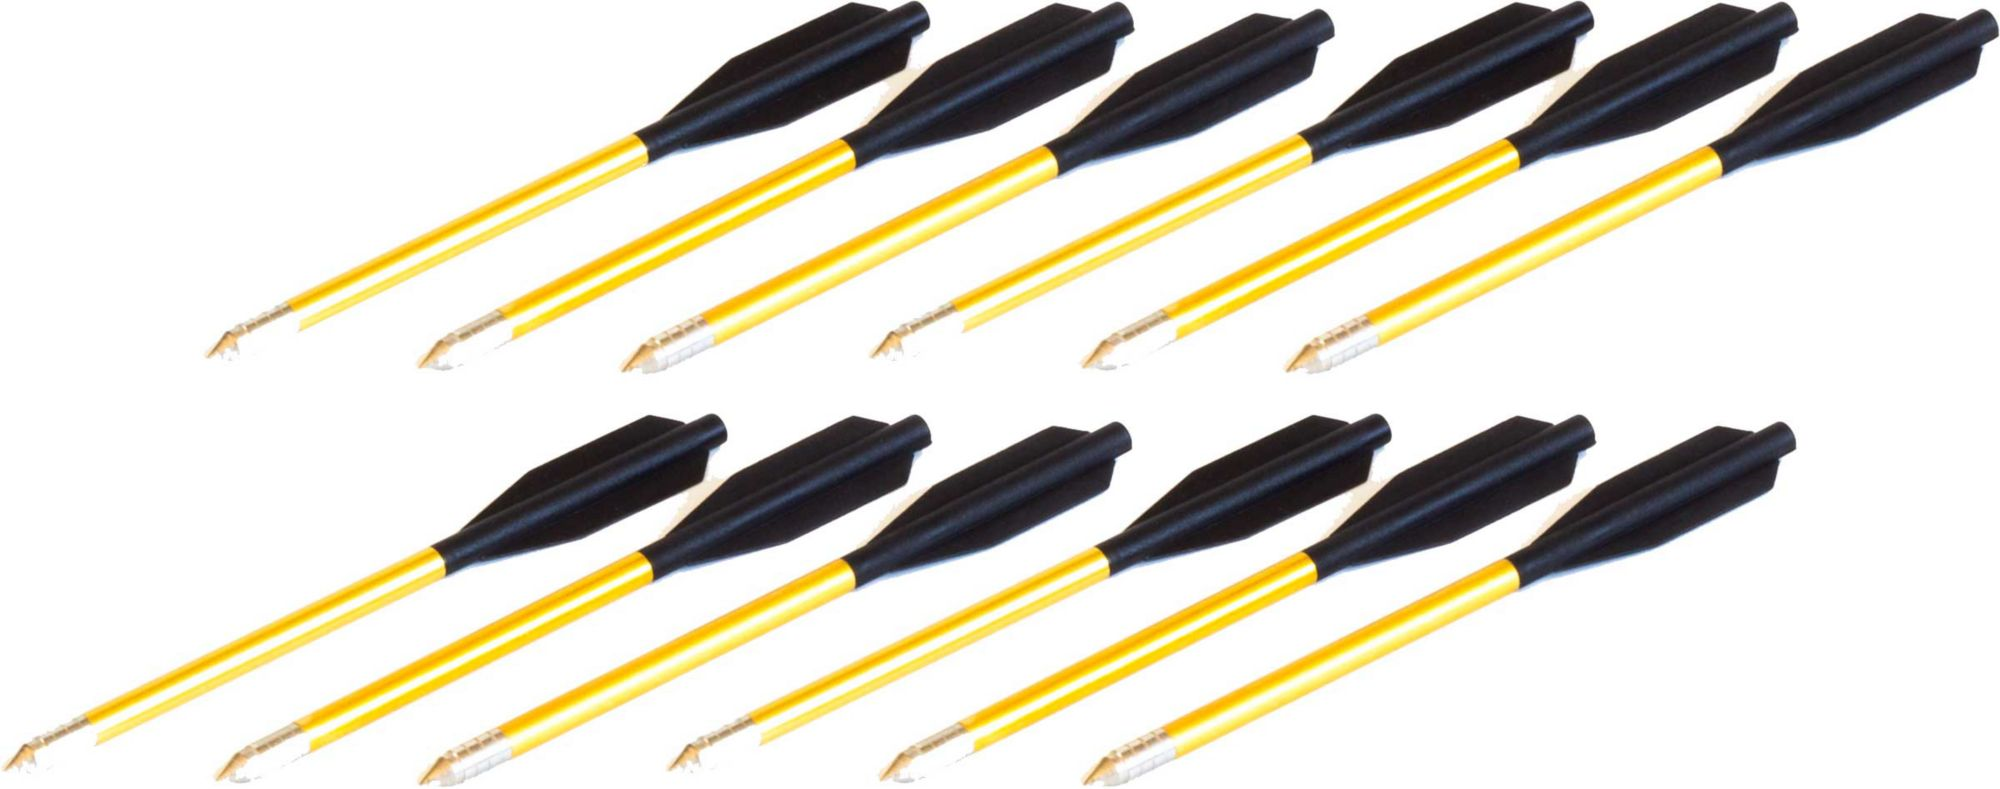 BOLT Crossbows Aluminum Crossbow Bolts - 12 Pack thumbnail